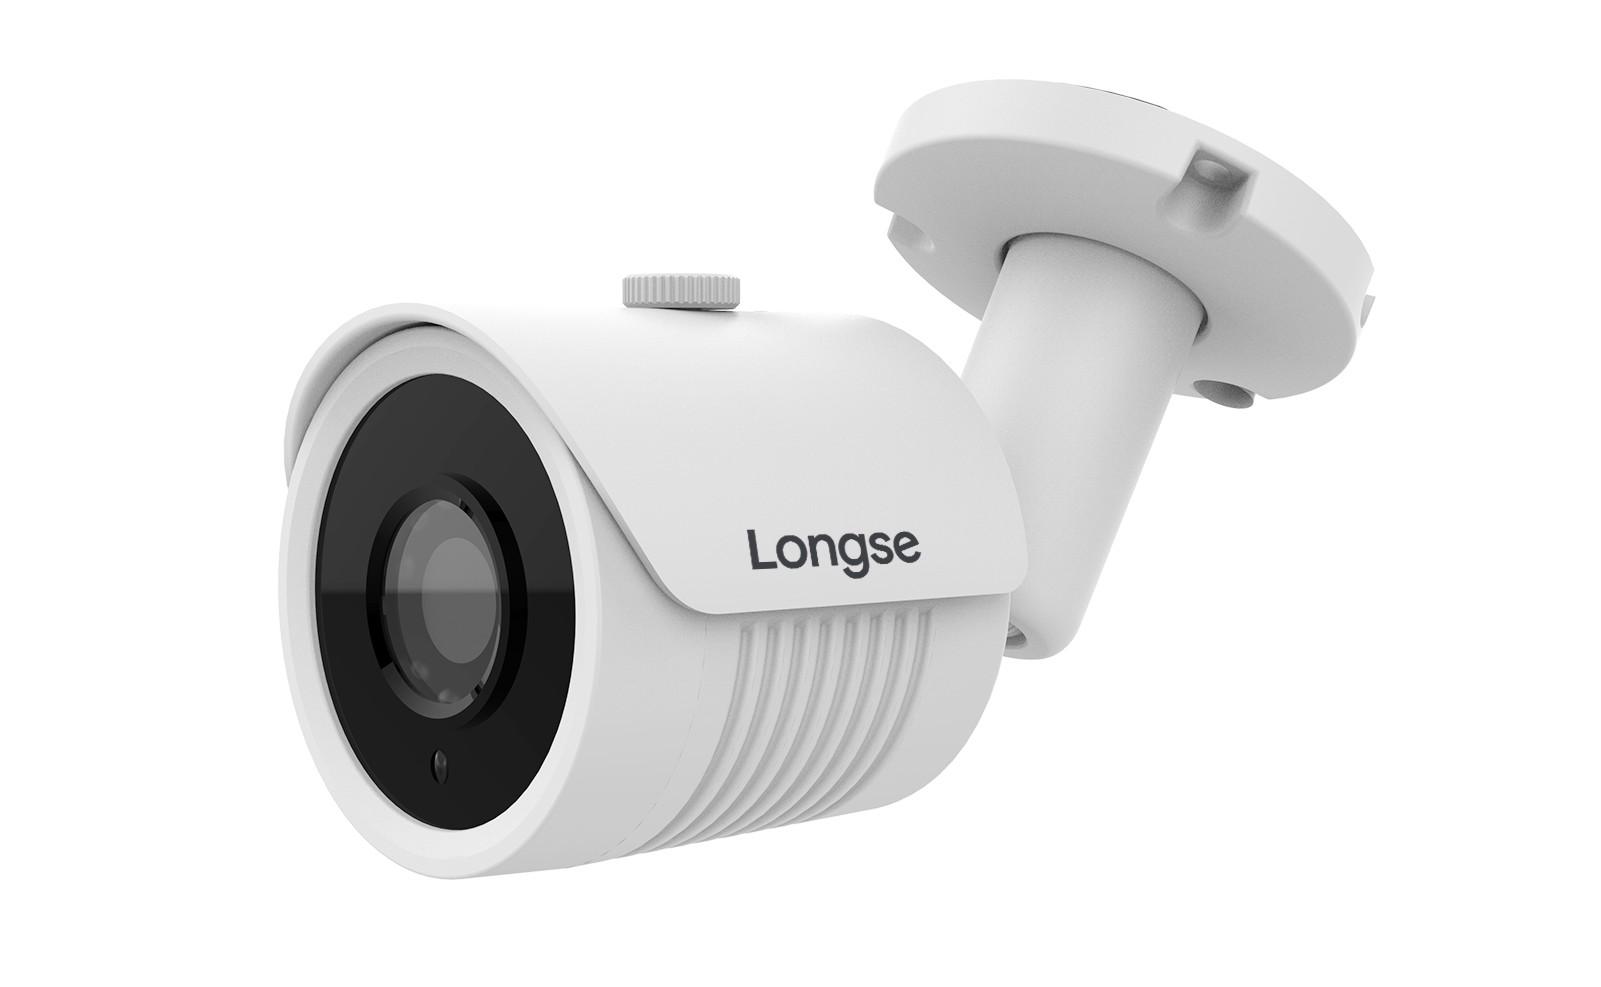 Artikelfoto Longse LBH30S800 8 Megapixel IP Kamera mit POE und 4mm Objektiv